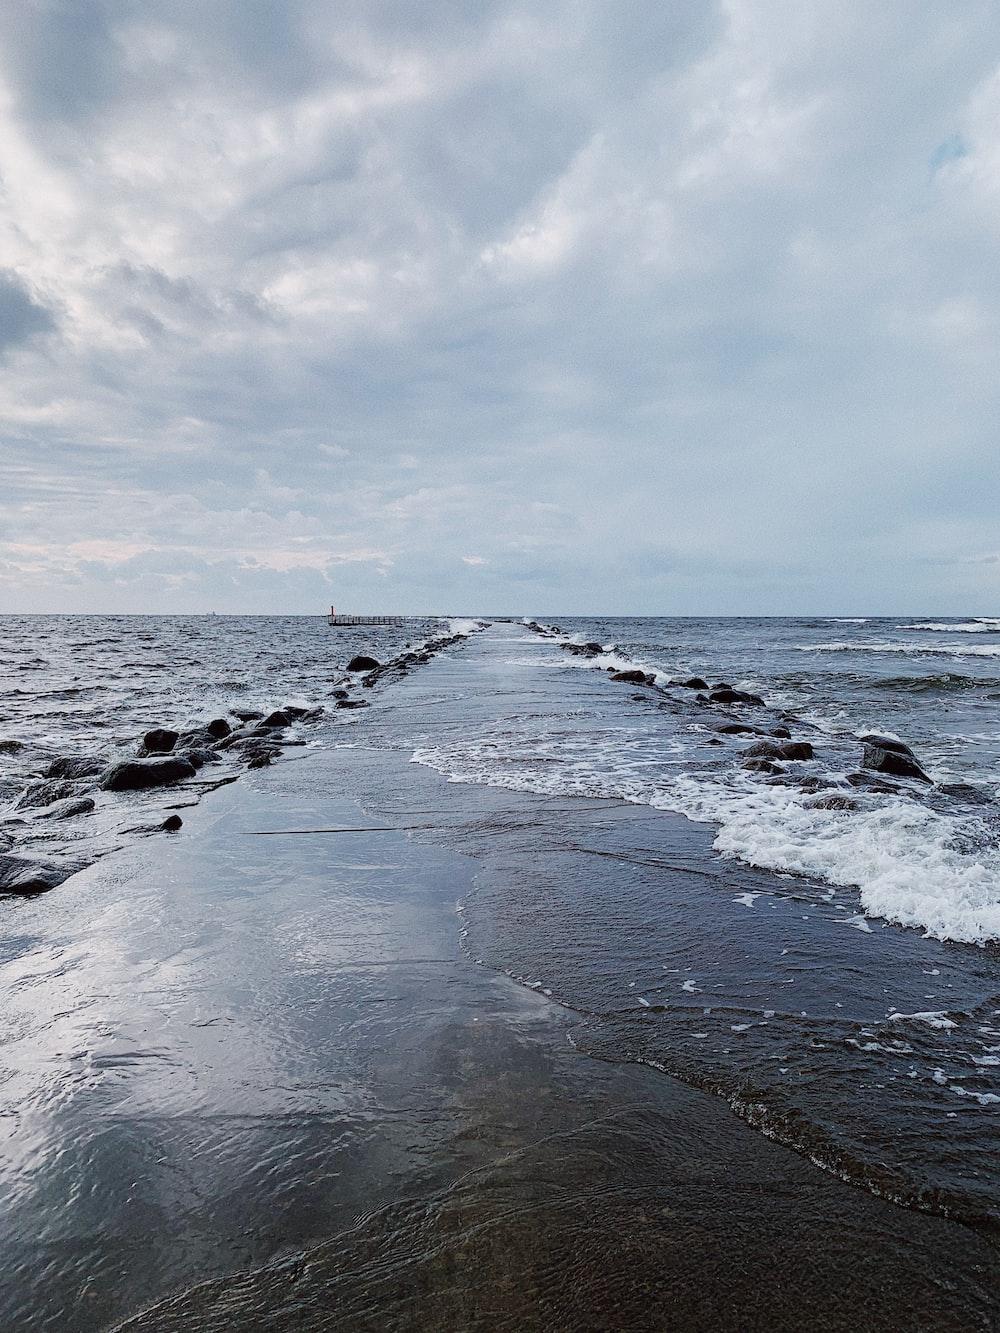 ocean waves crashing on shore under white clouds during daytime